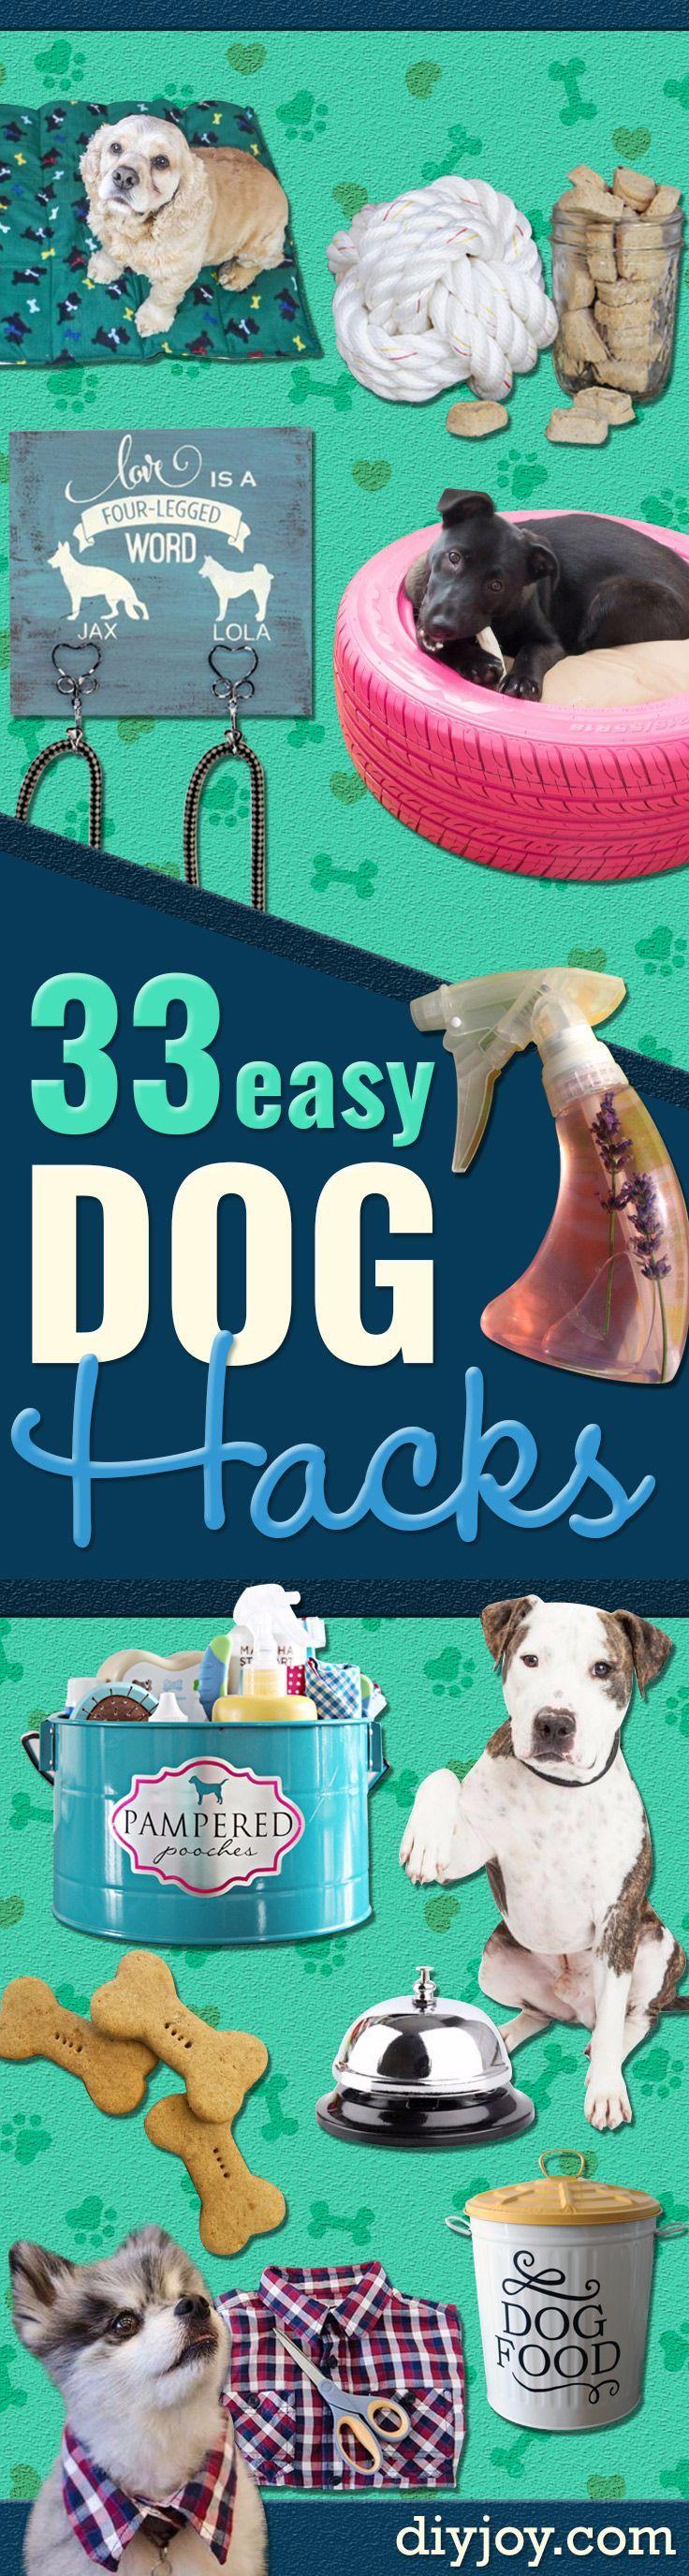 Diy dog hacks training tips ideas for dog beds and toys homemade diy dog hacks training tips ideas for dog beds and toys homemade remedies solutioingenieria Gallery